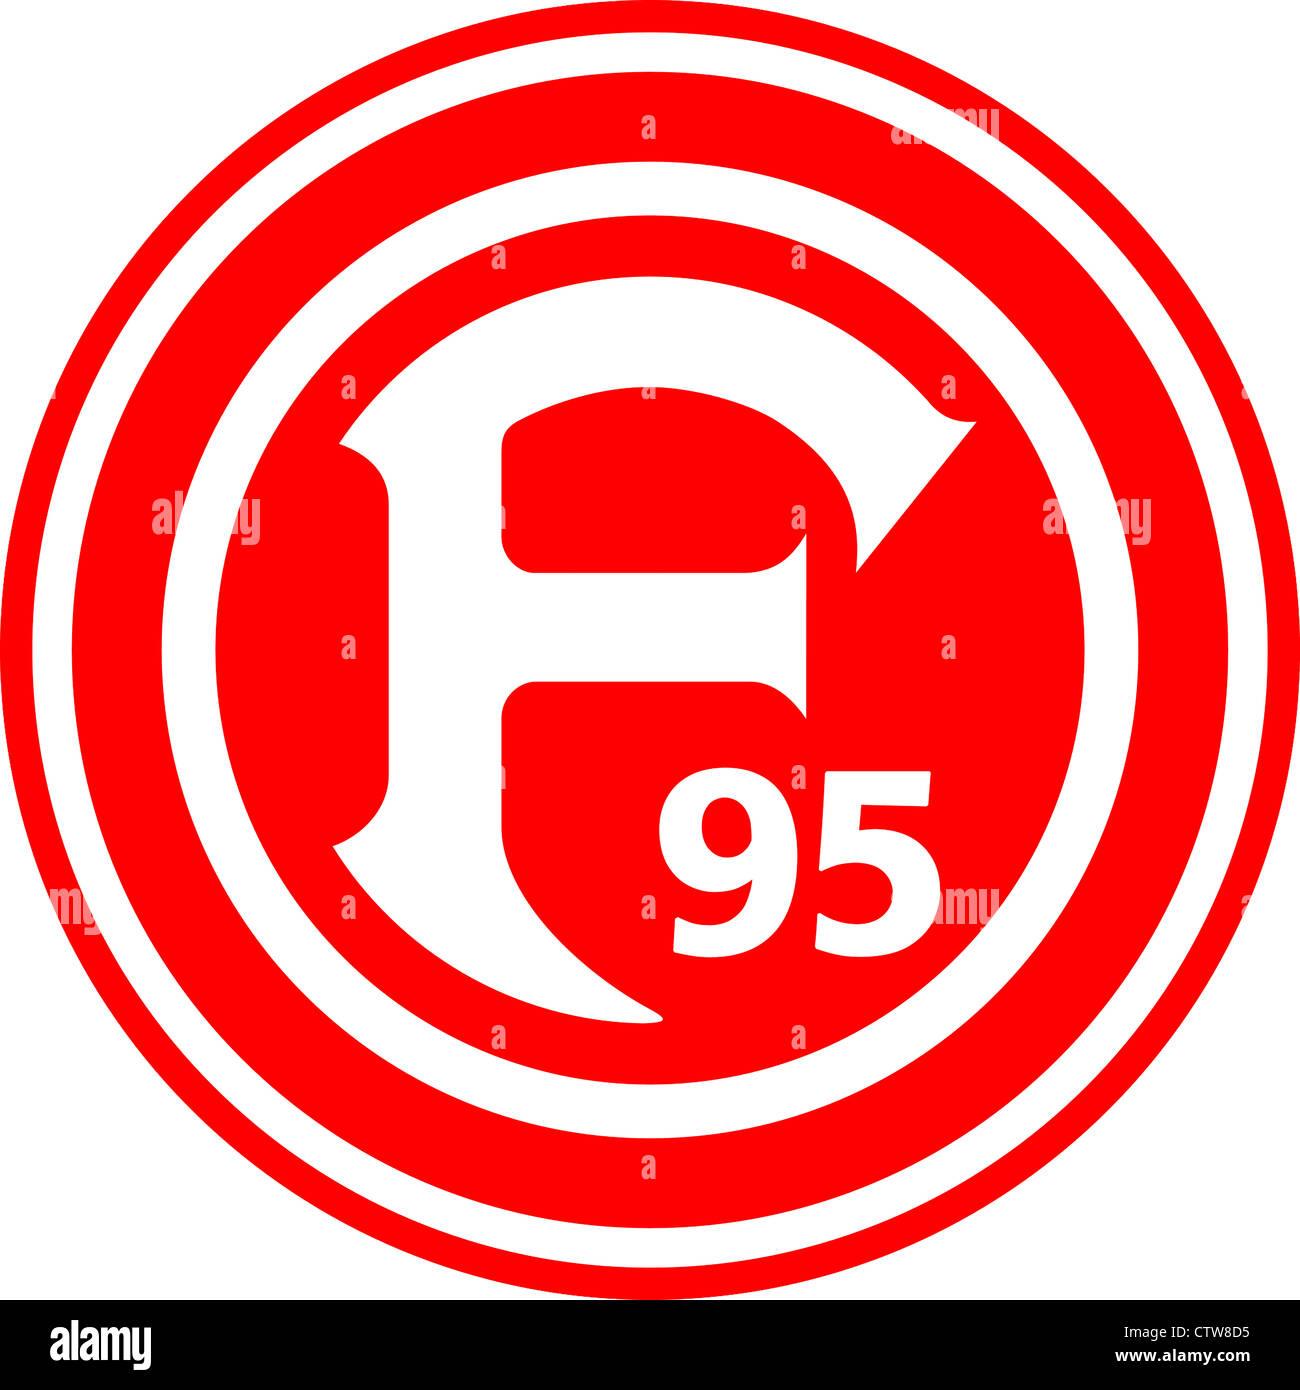 https www alamy com stock photo logo of german football team fortuna duesseldorf 49727921 html